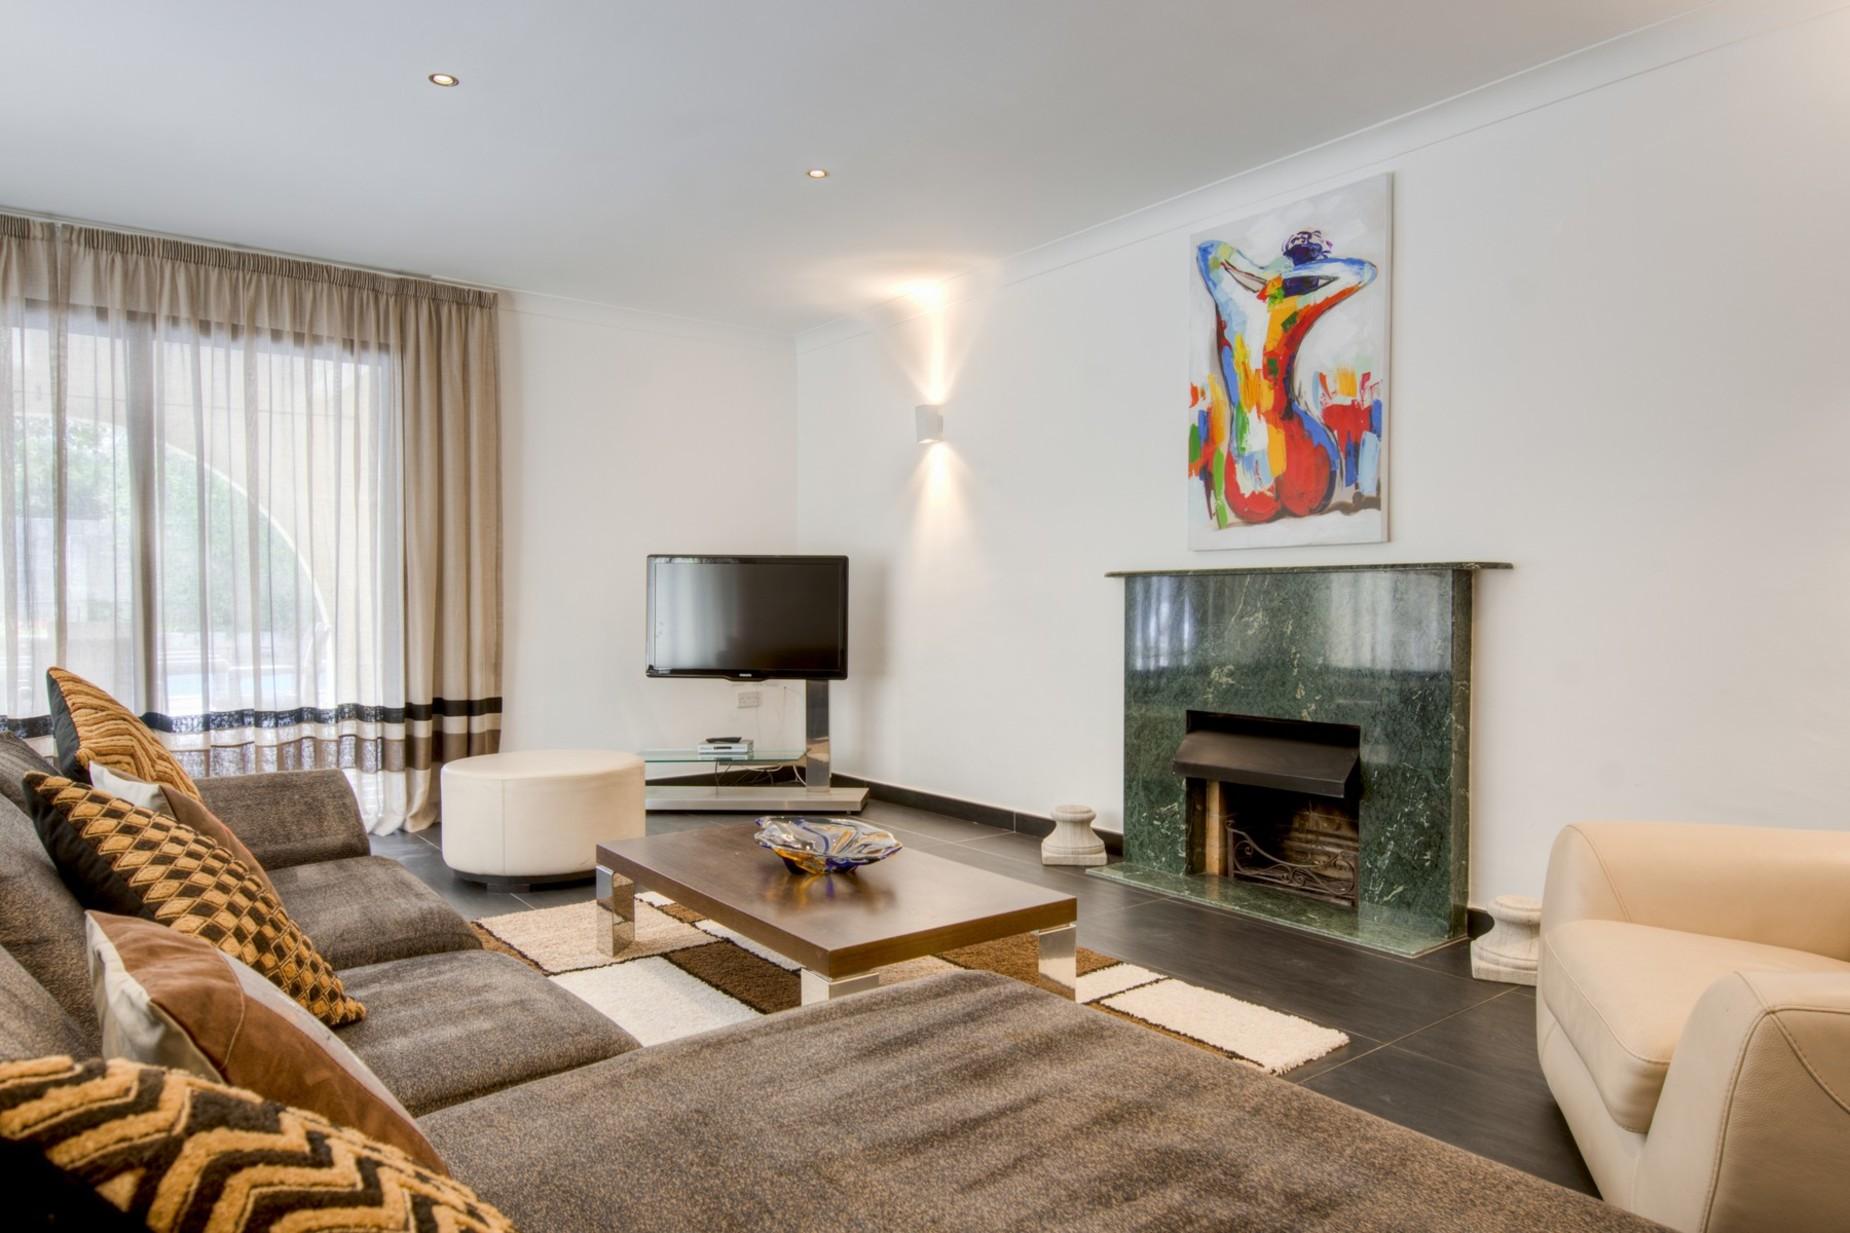 4 bed Villa For Sale in Bahar ic-Caghaq, Bahar ic-Caghaq - thumb 12